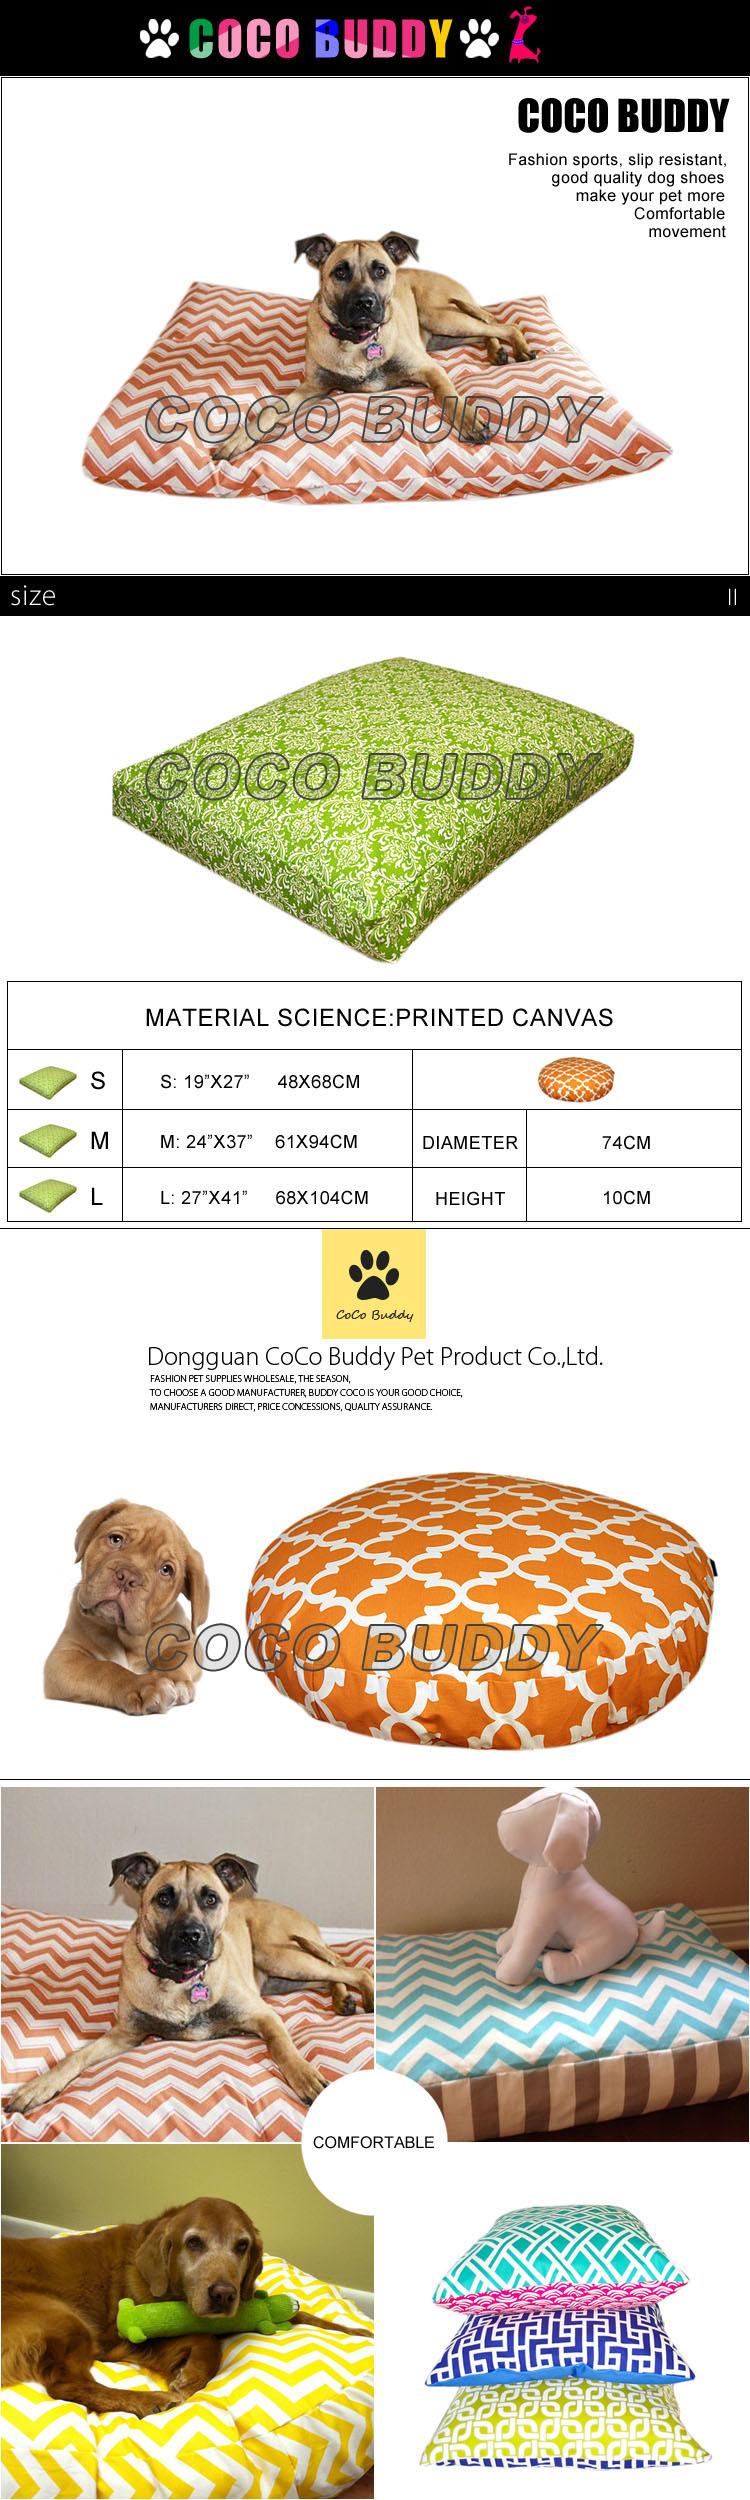 Soft Comfortable Pet Dog Beds 100 Canvas Fabric  : HTB1j6zFKXXXXXaPXVXXq6xXFXXXf from cocobuddy.en.alibaba.com size 750 x 2500 jpeg 424kB